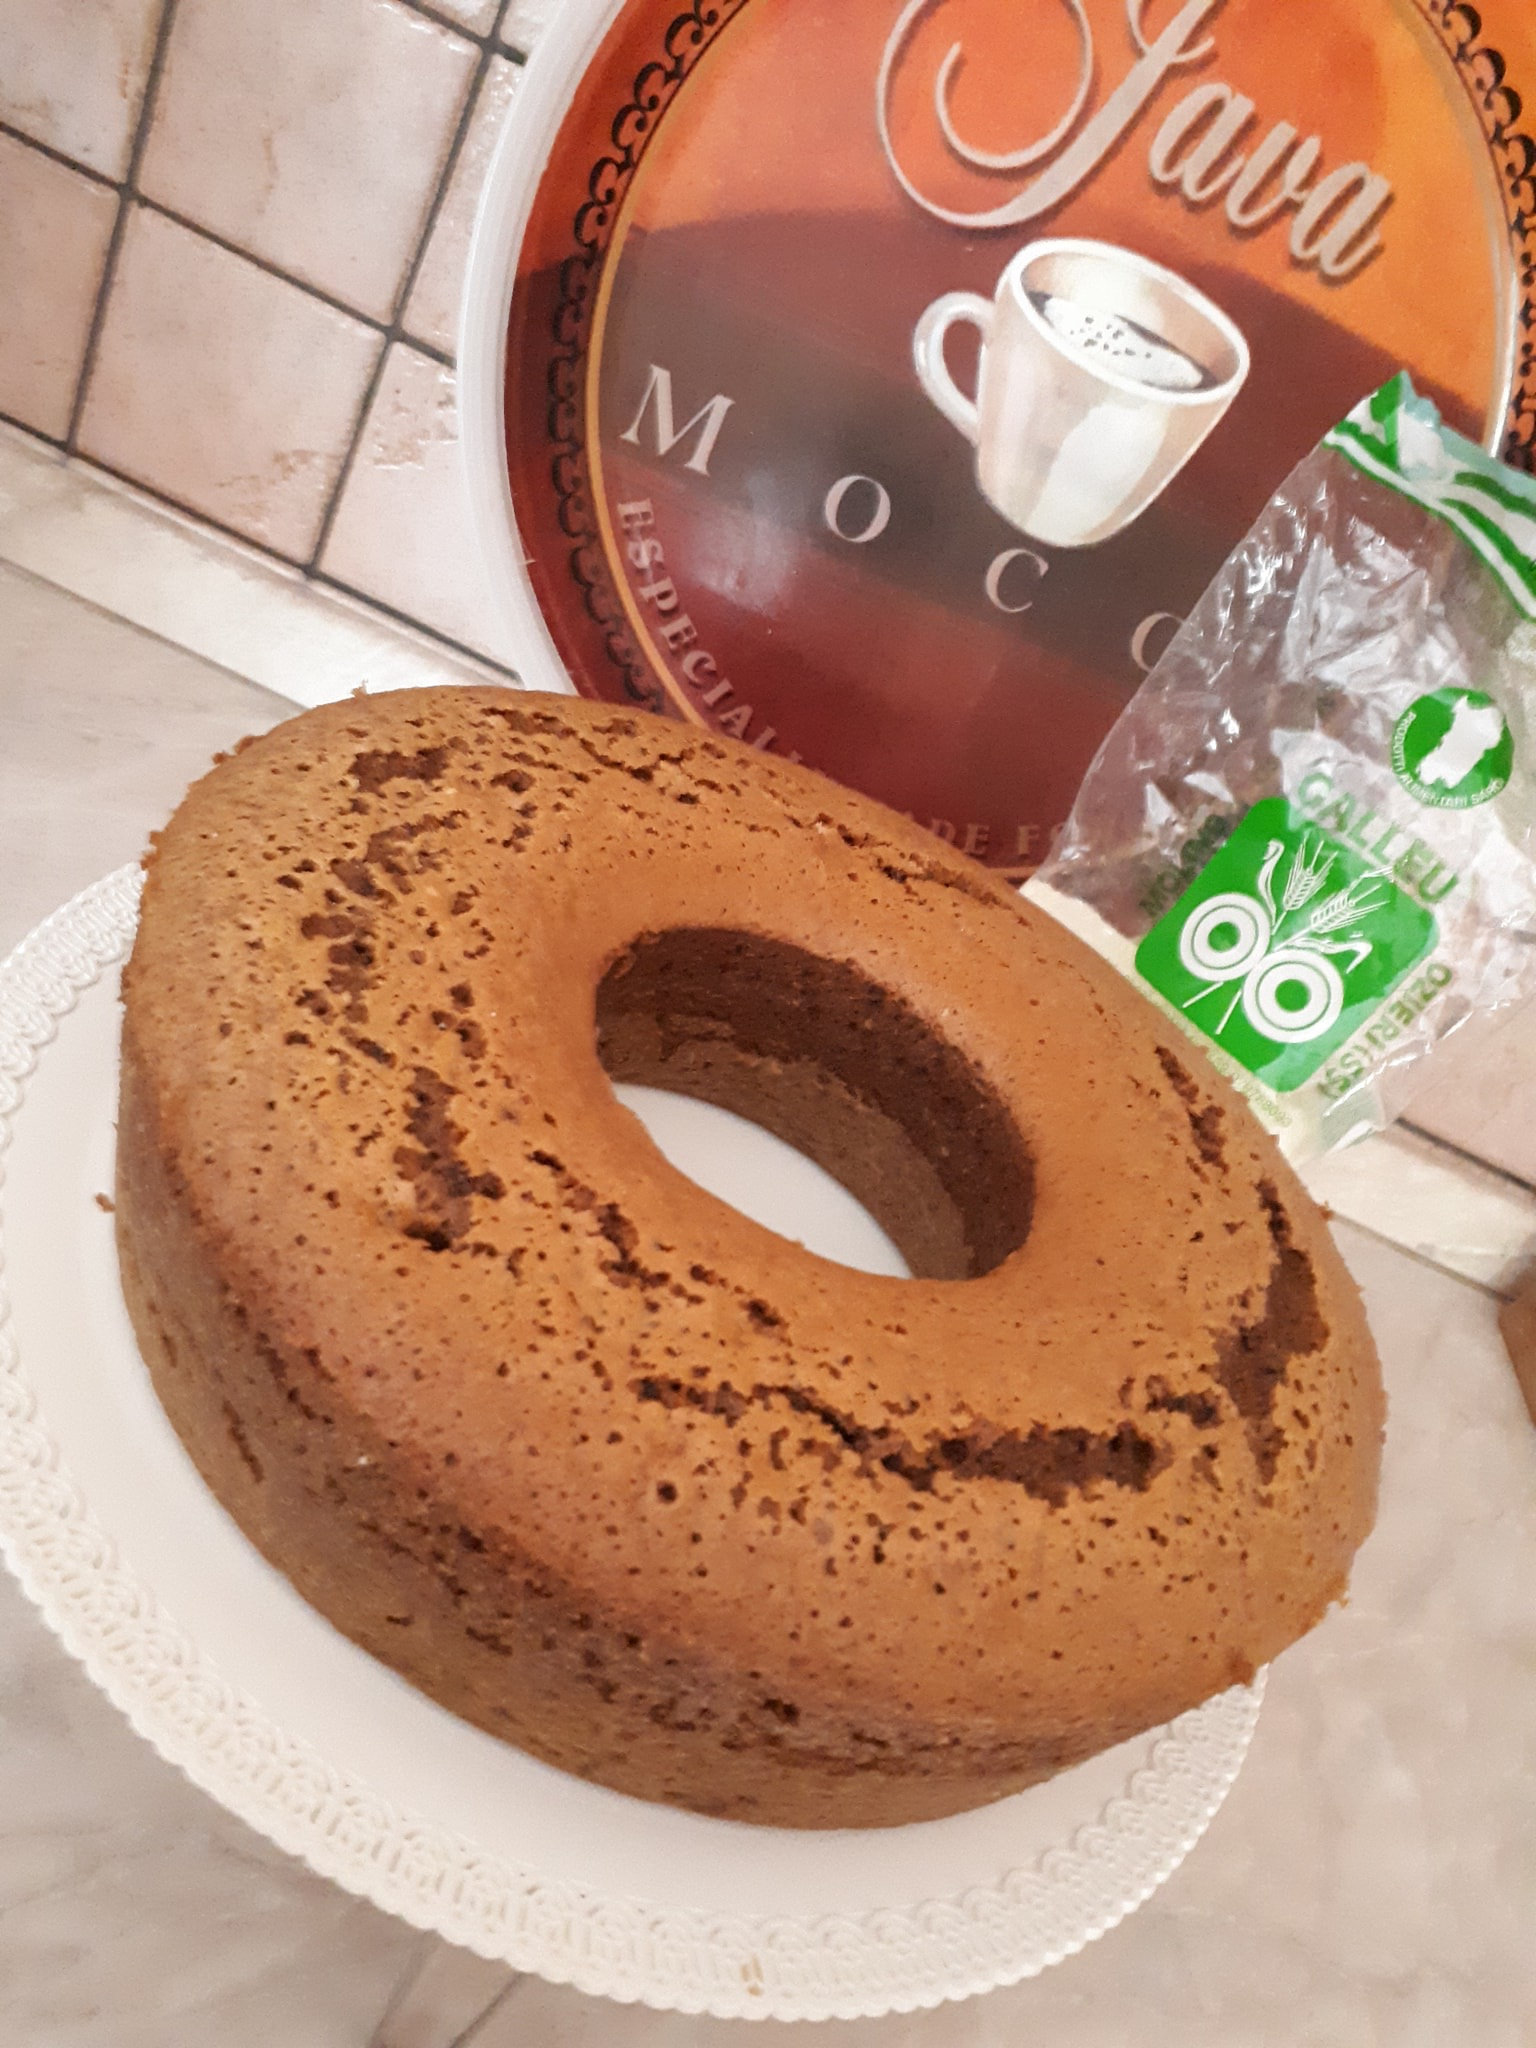 TORTA AL CAFFE (CAPPUCCINO)